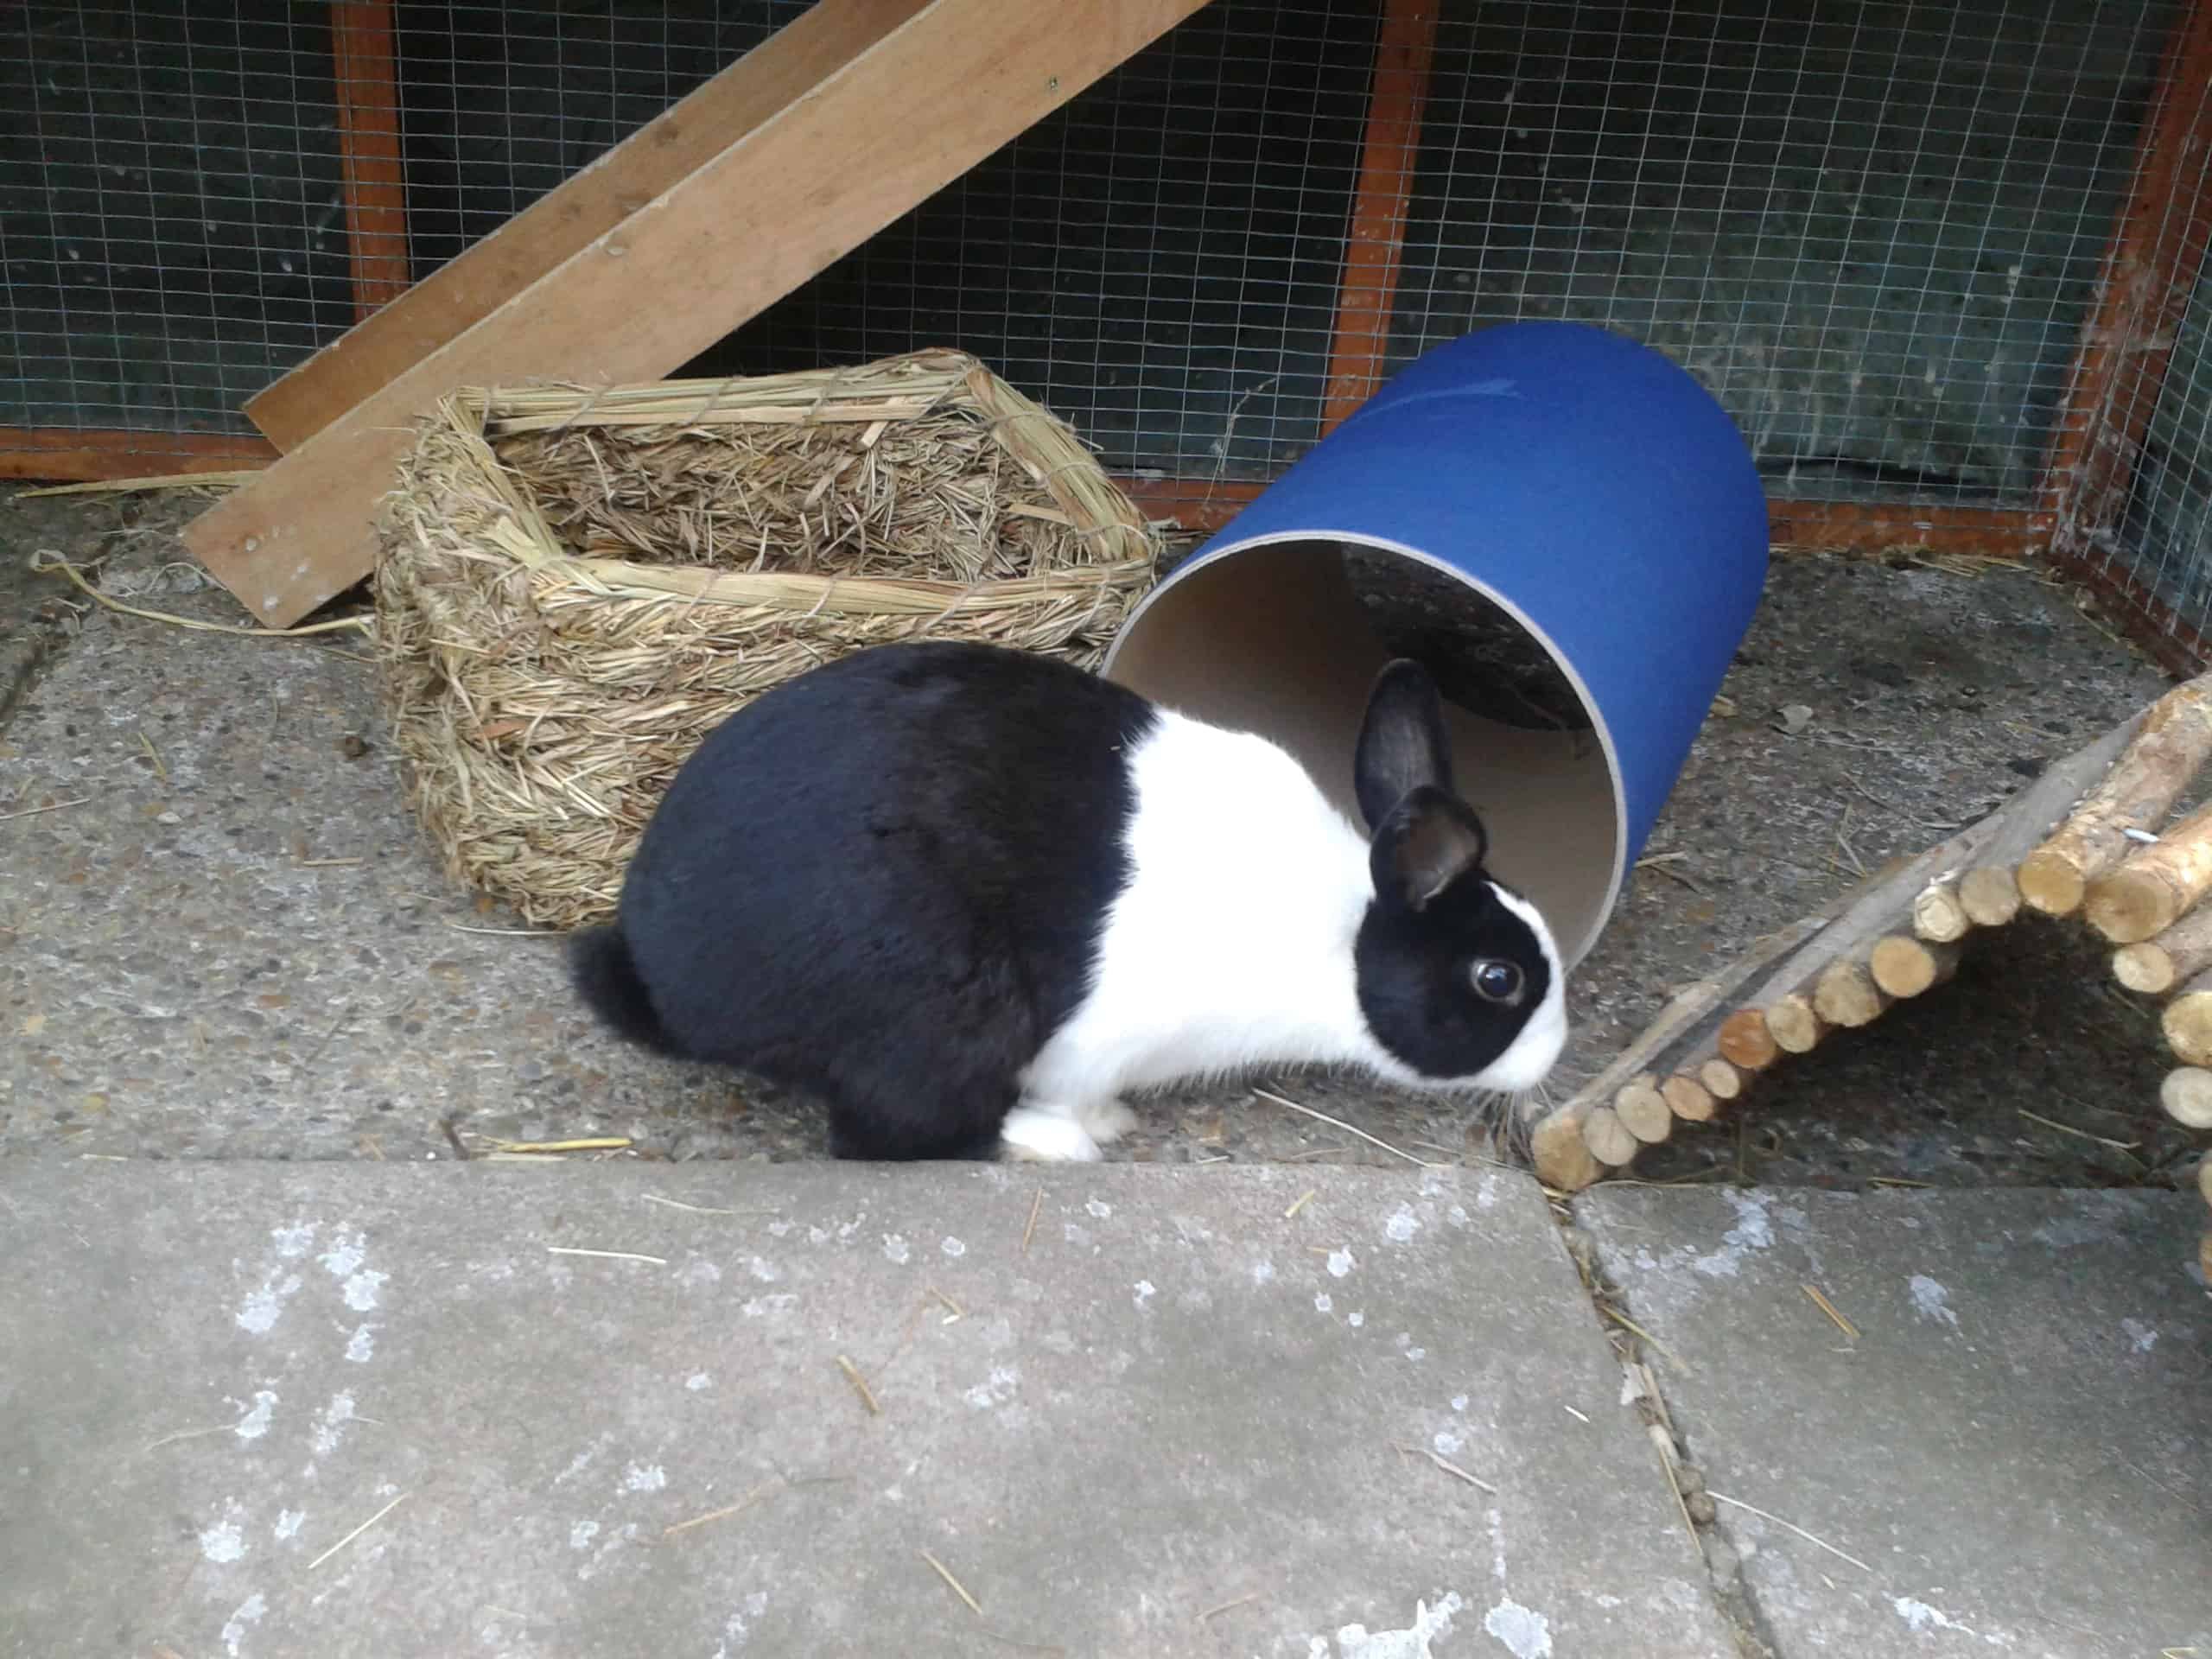 Mopsy in his hutch